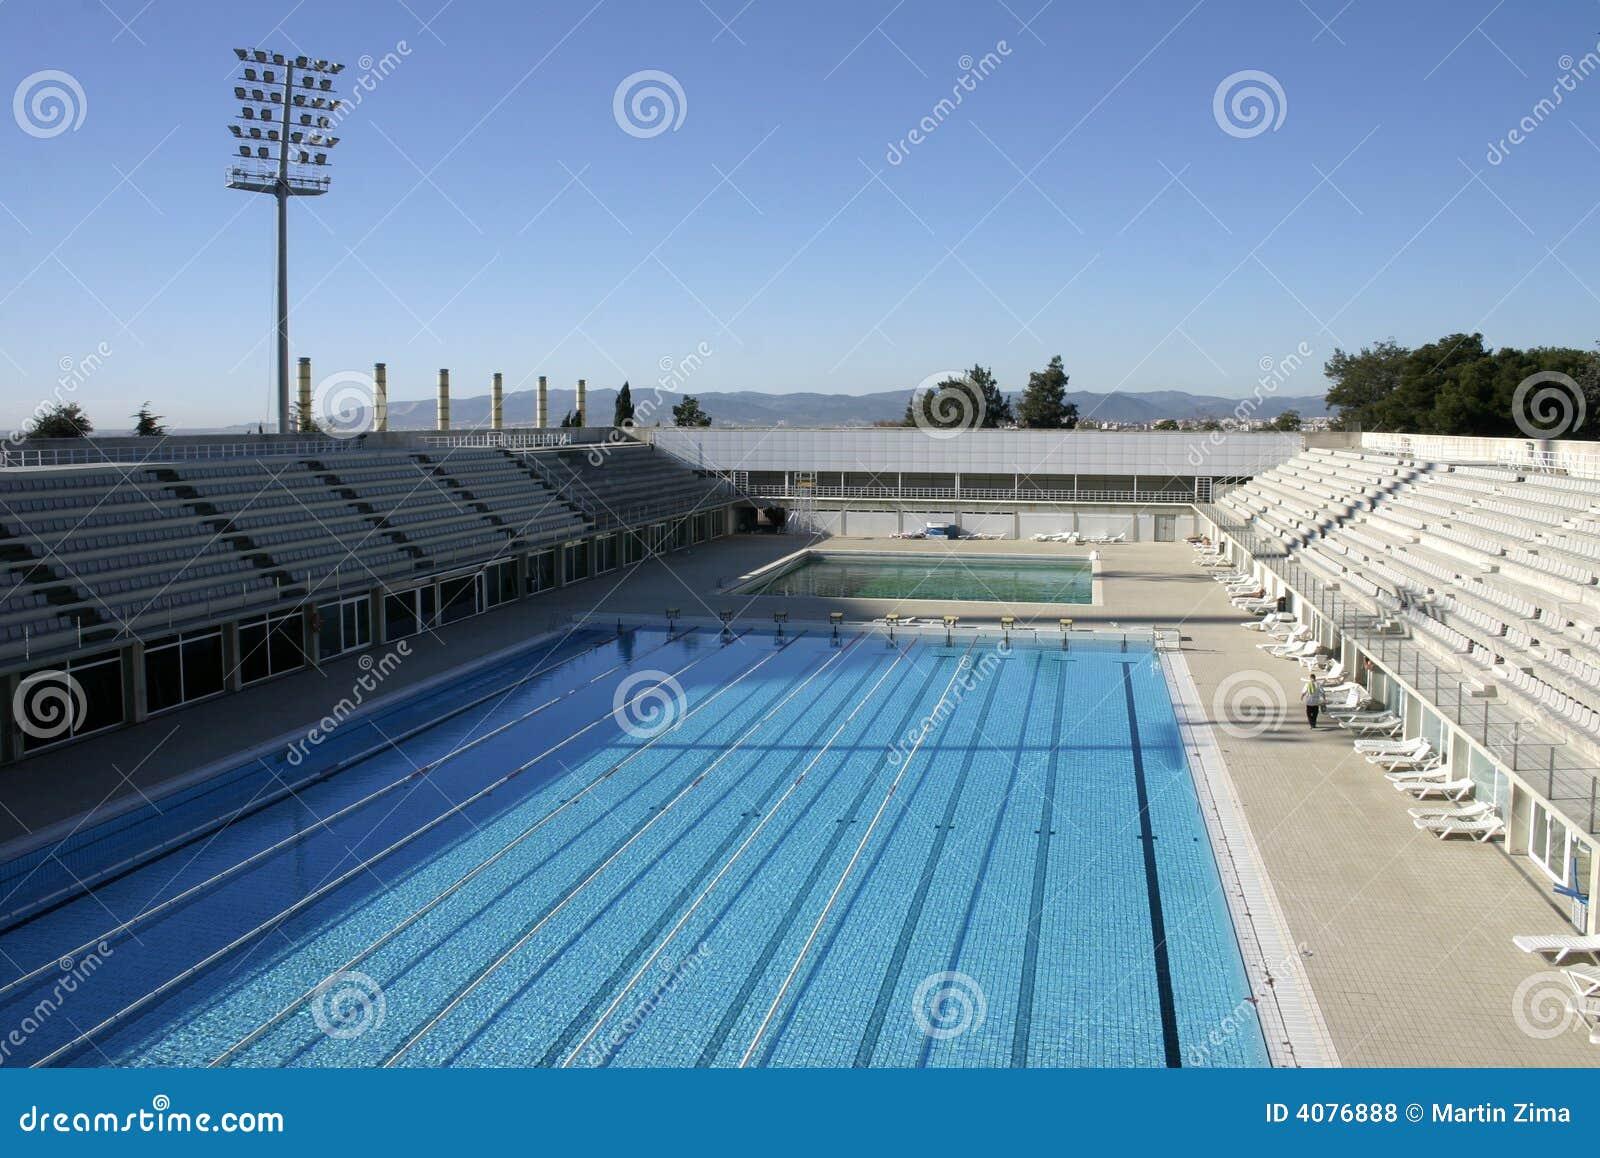 Piscina ol mpica fotos de stock royalty free imagem 4076888 for Piscina olimpica barcelona